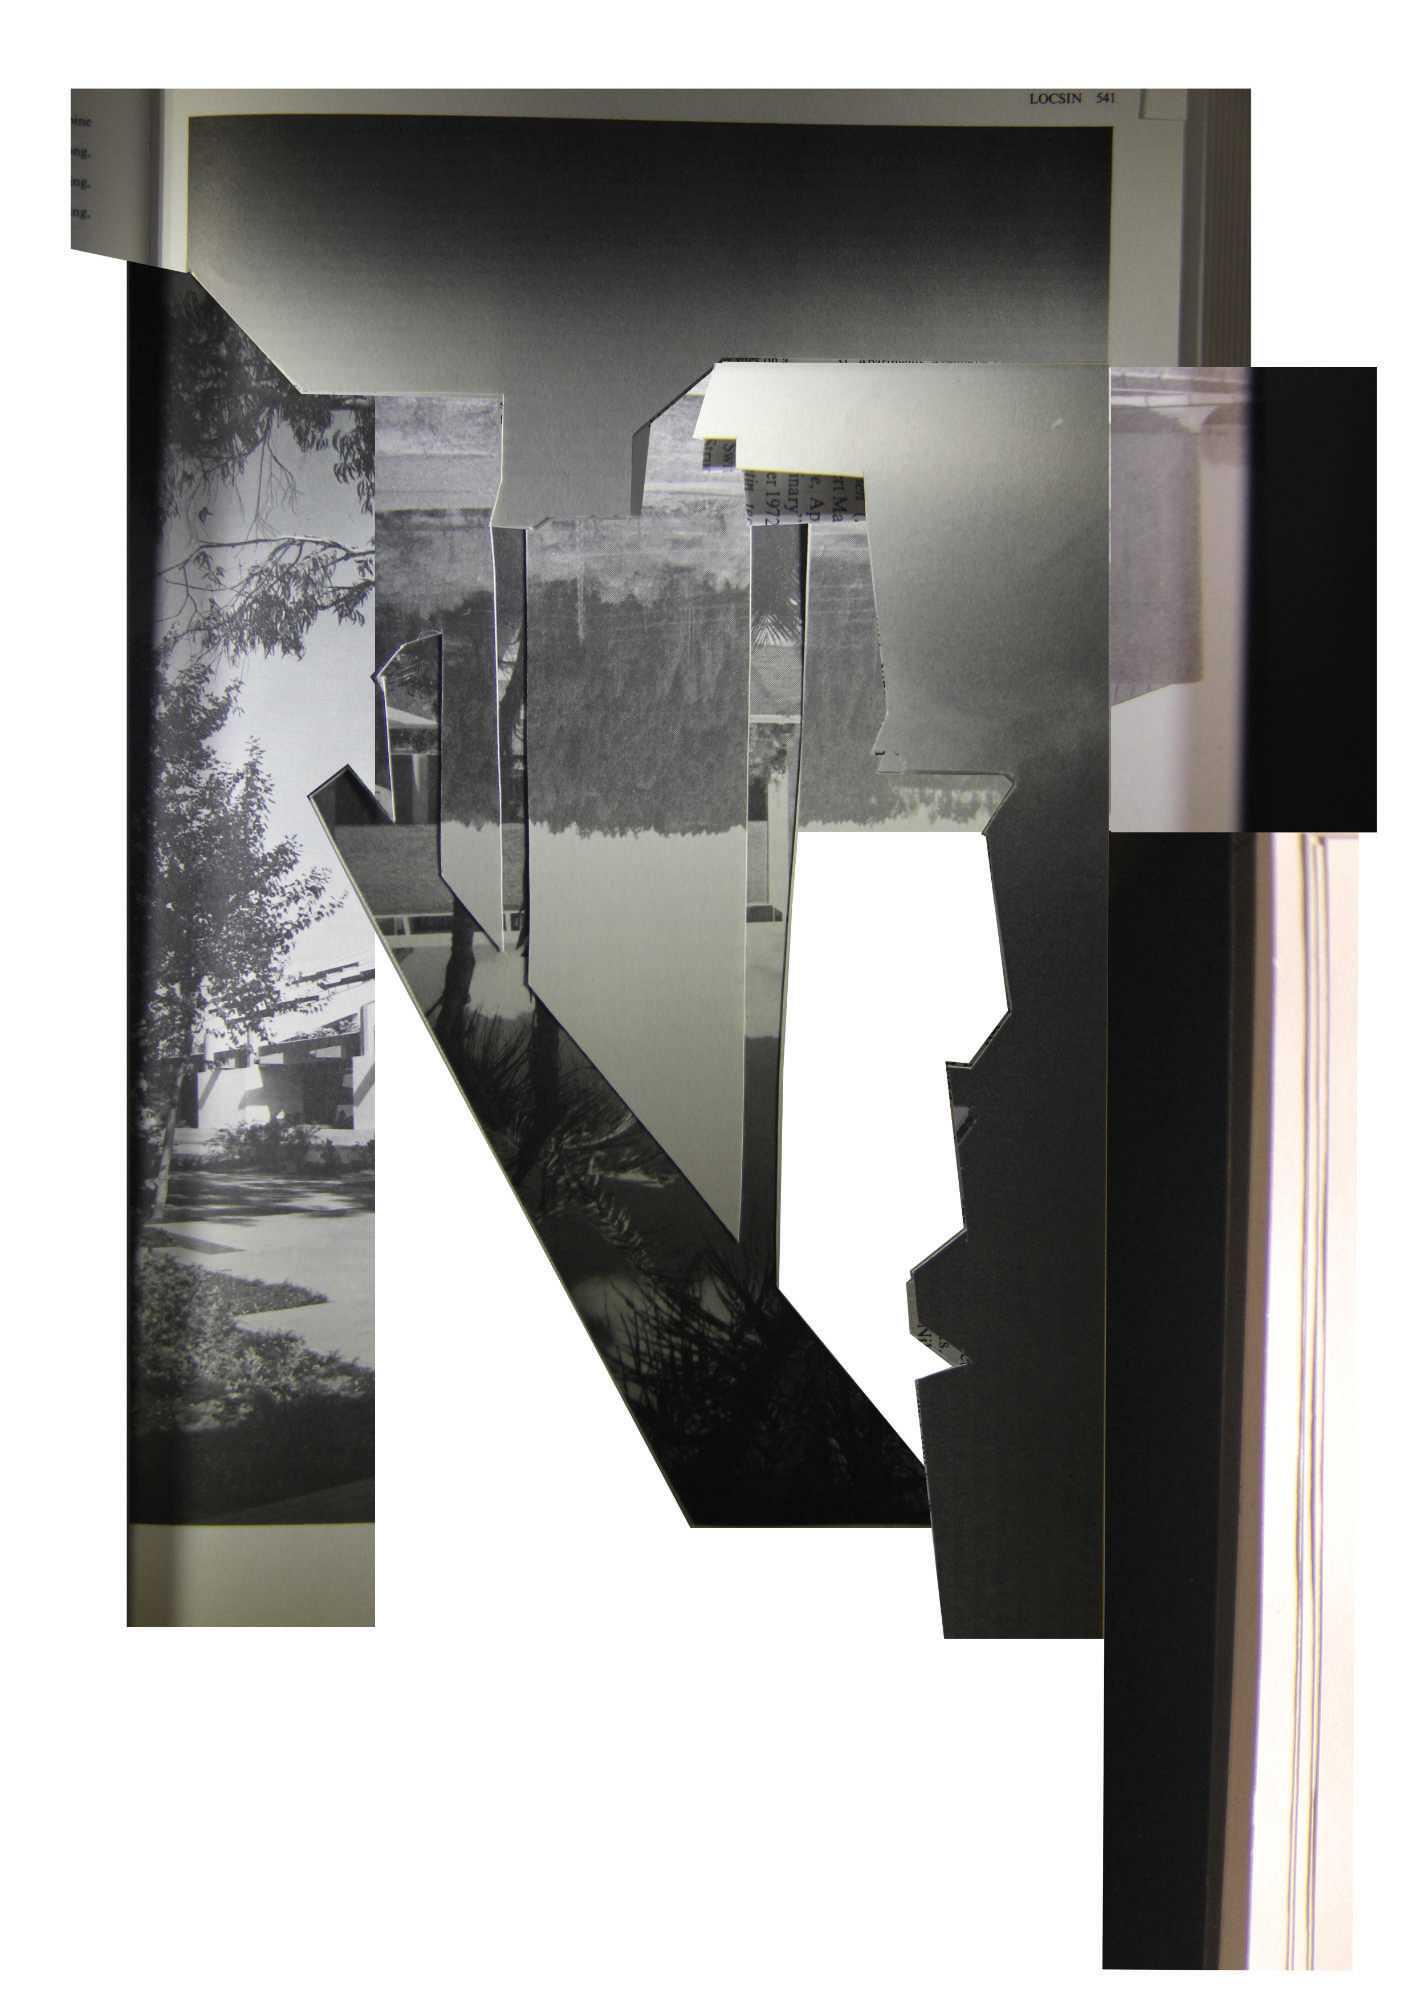 Neue Technik 6/1, Marc Allgaier, 2020